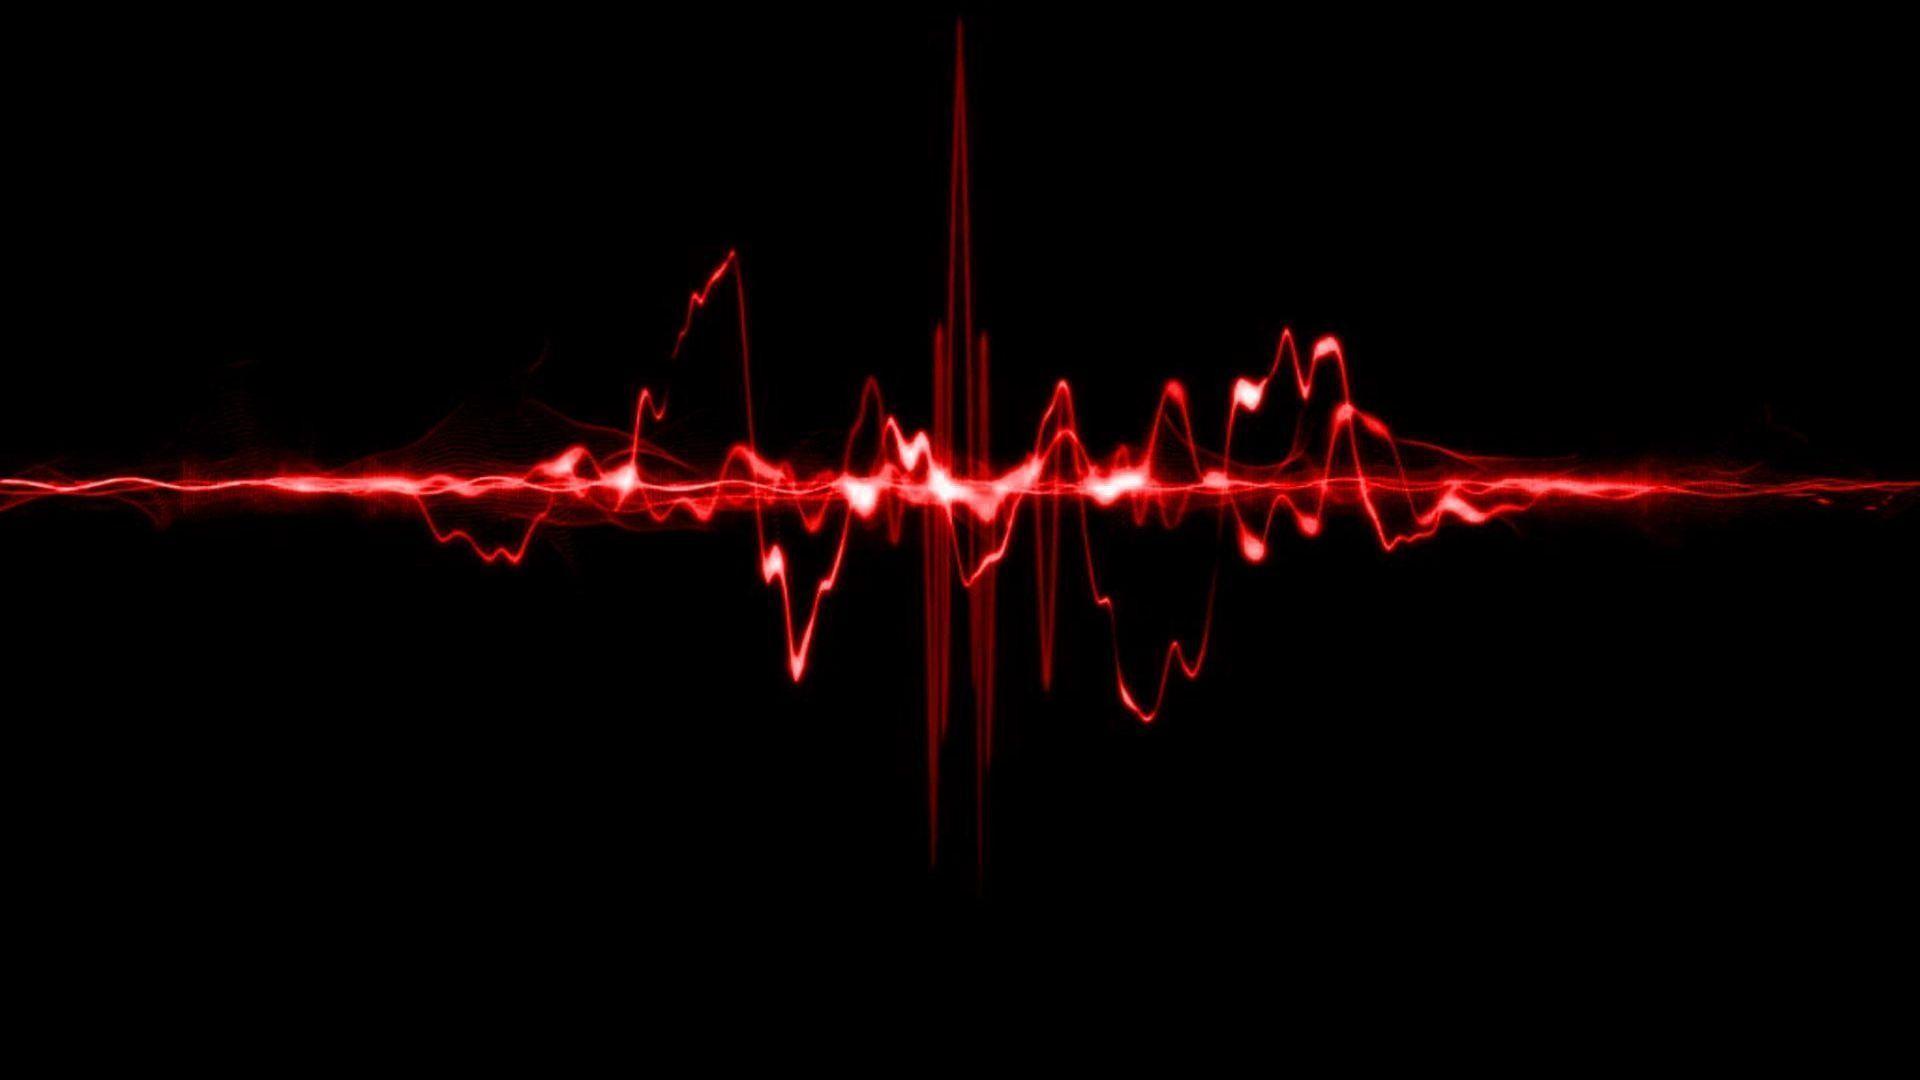 Most Inspiring Wallpaper Music Soundwave - 9cedfb36395862cd83d305bf2cfeaff9  Pictures_597691.jpg